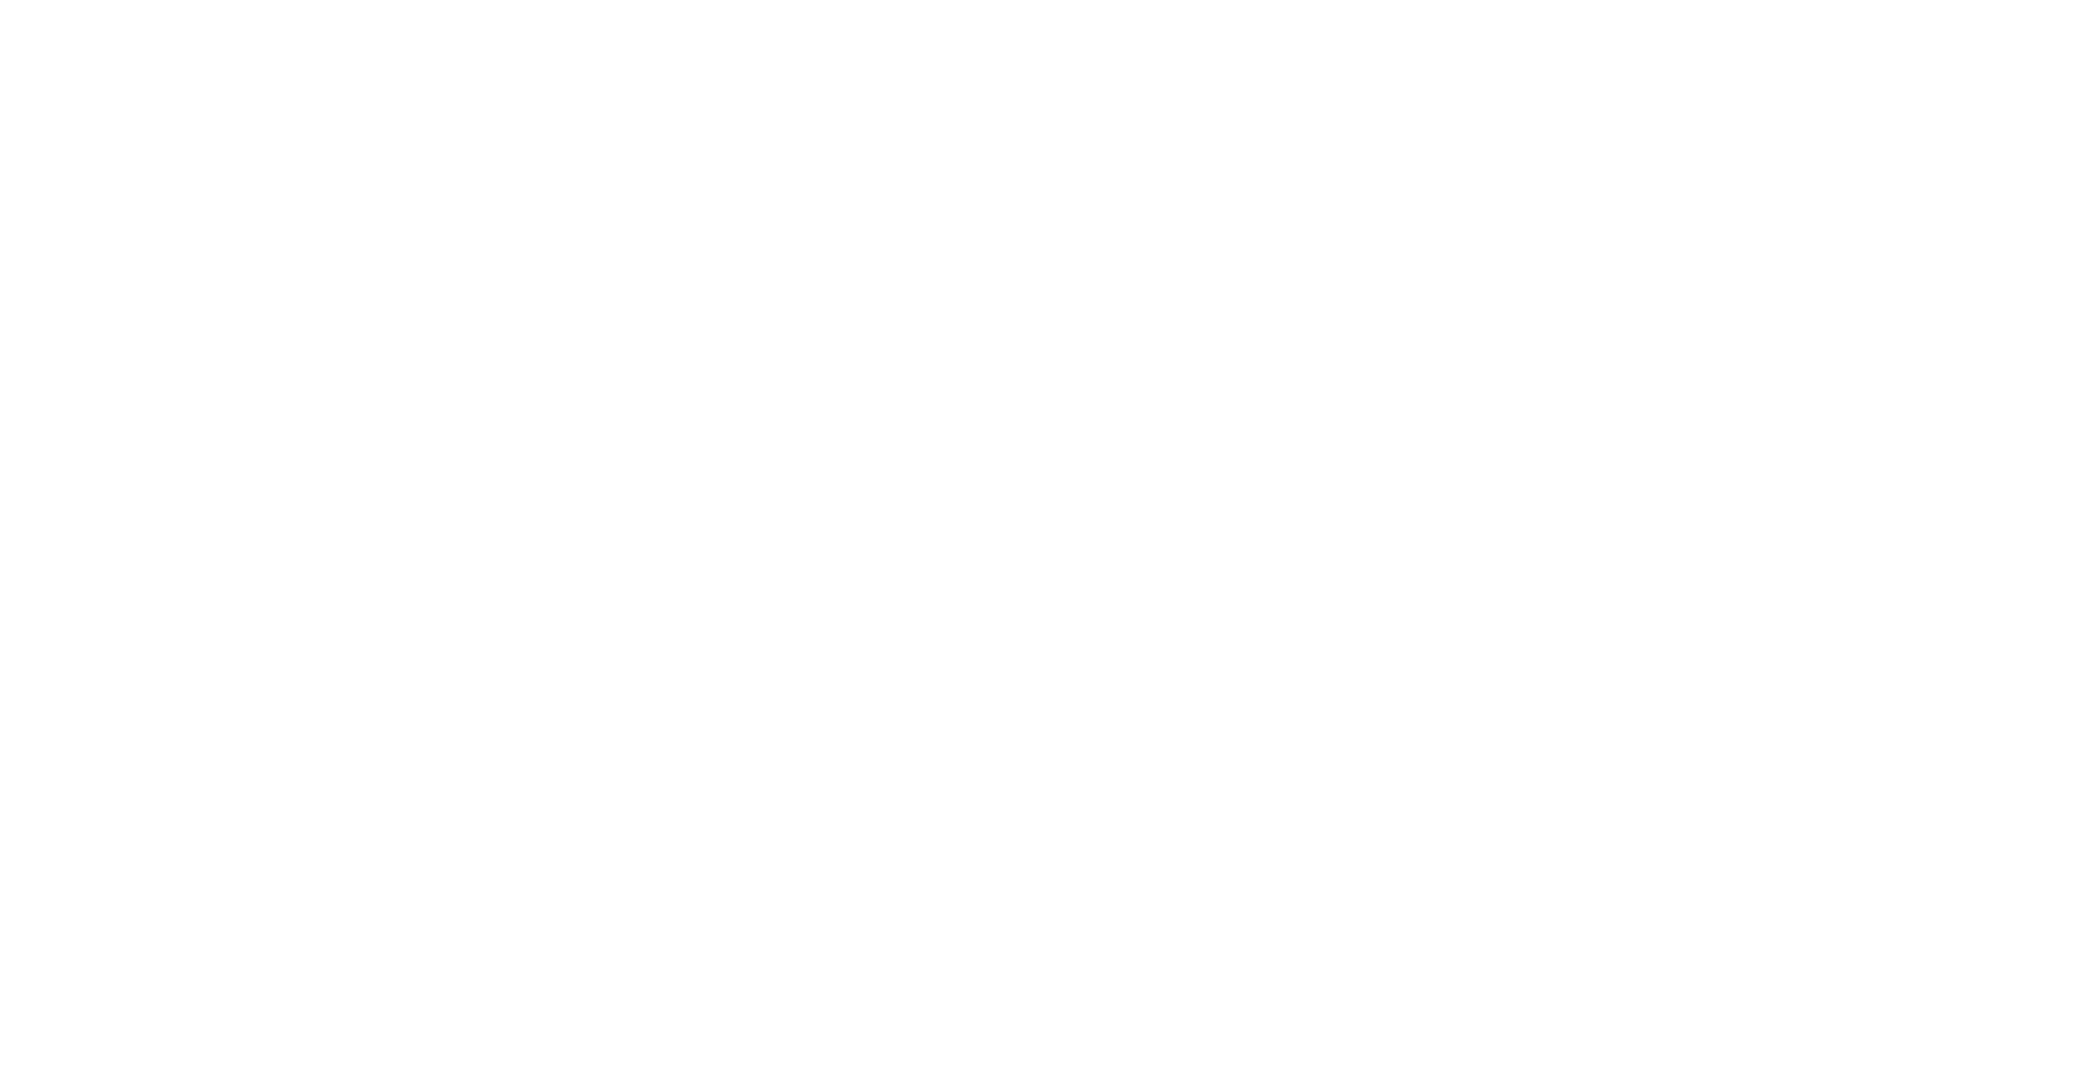 Logo Fecor negativo